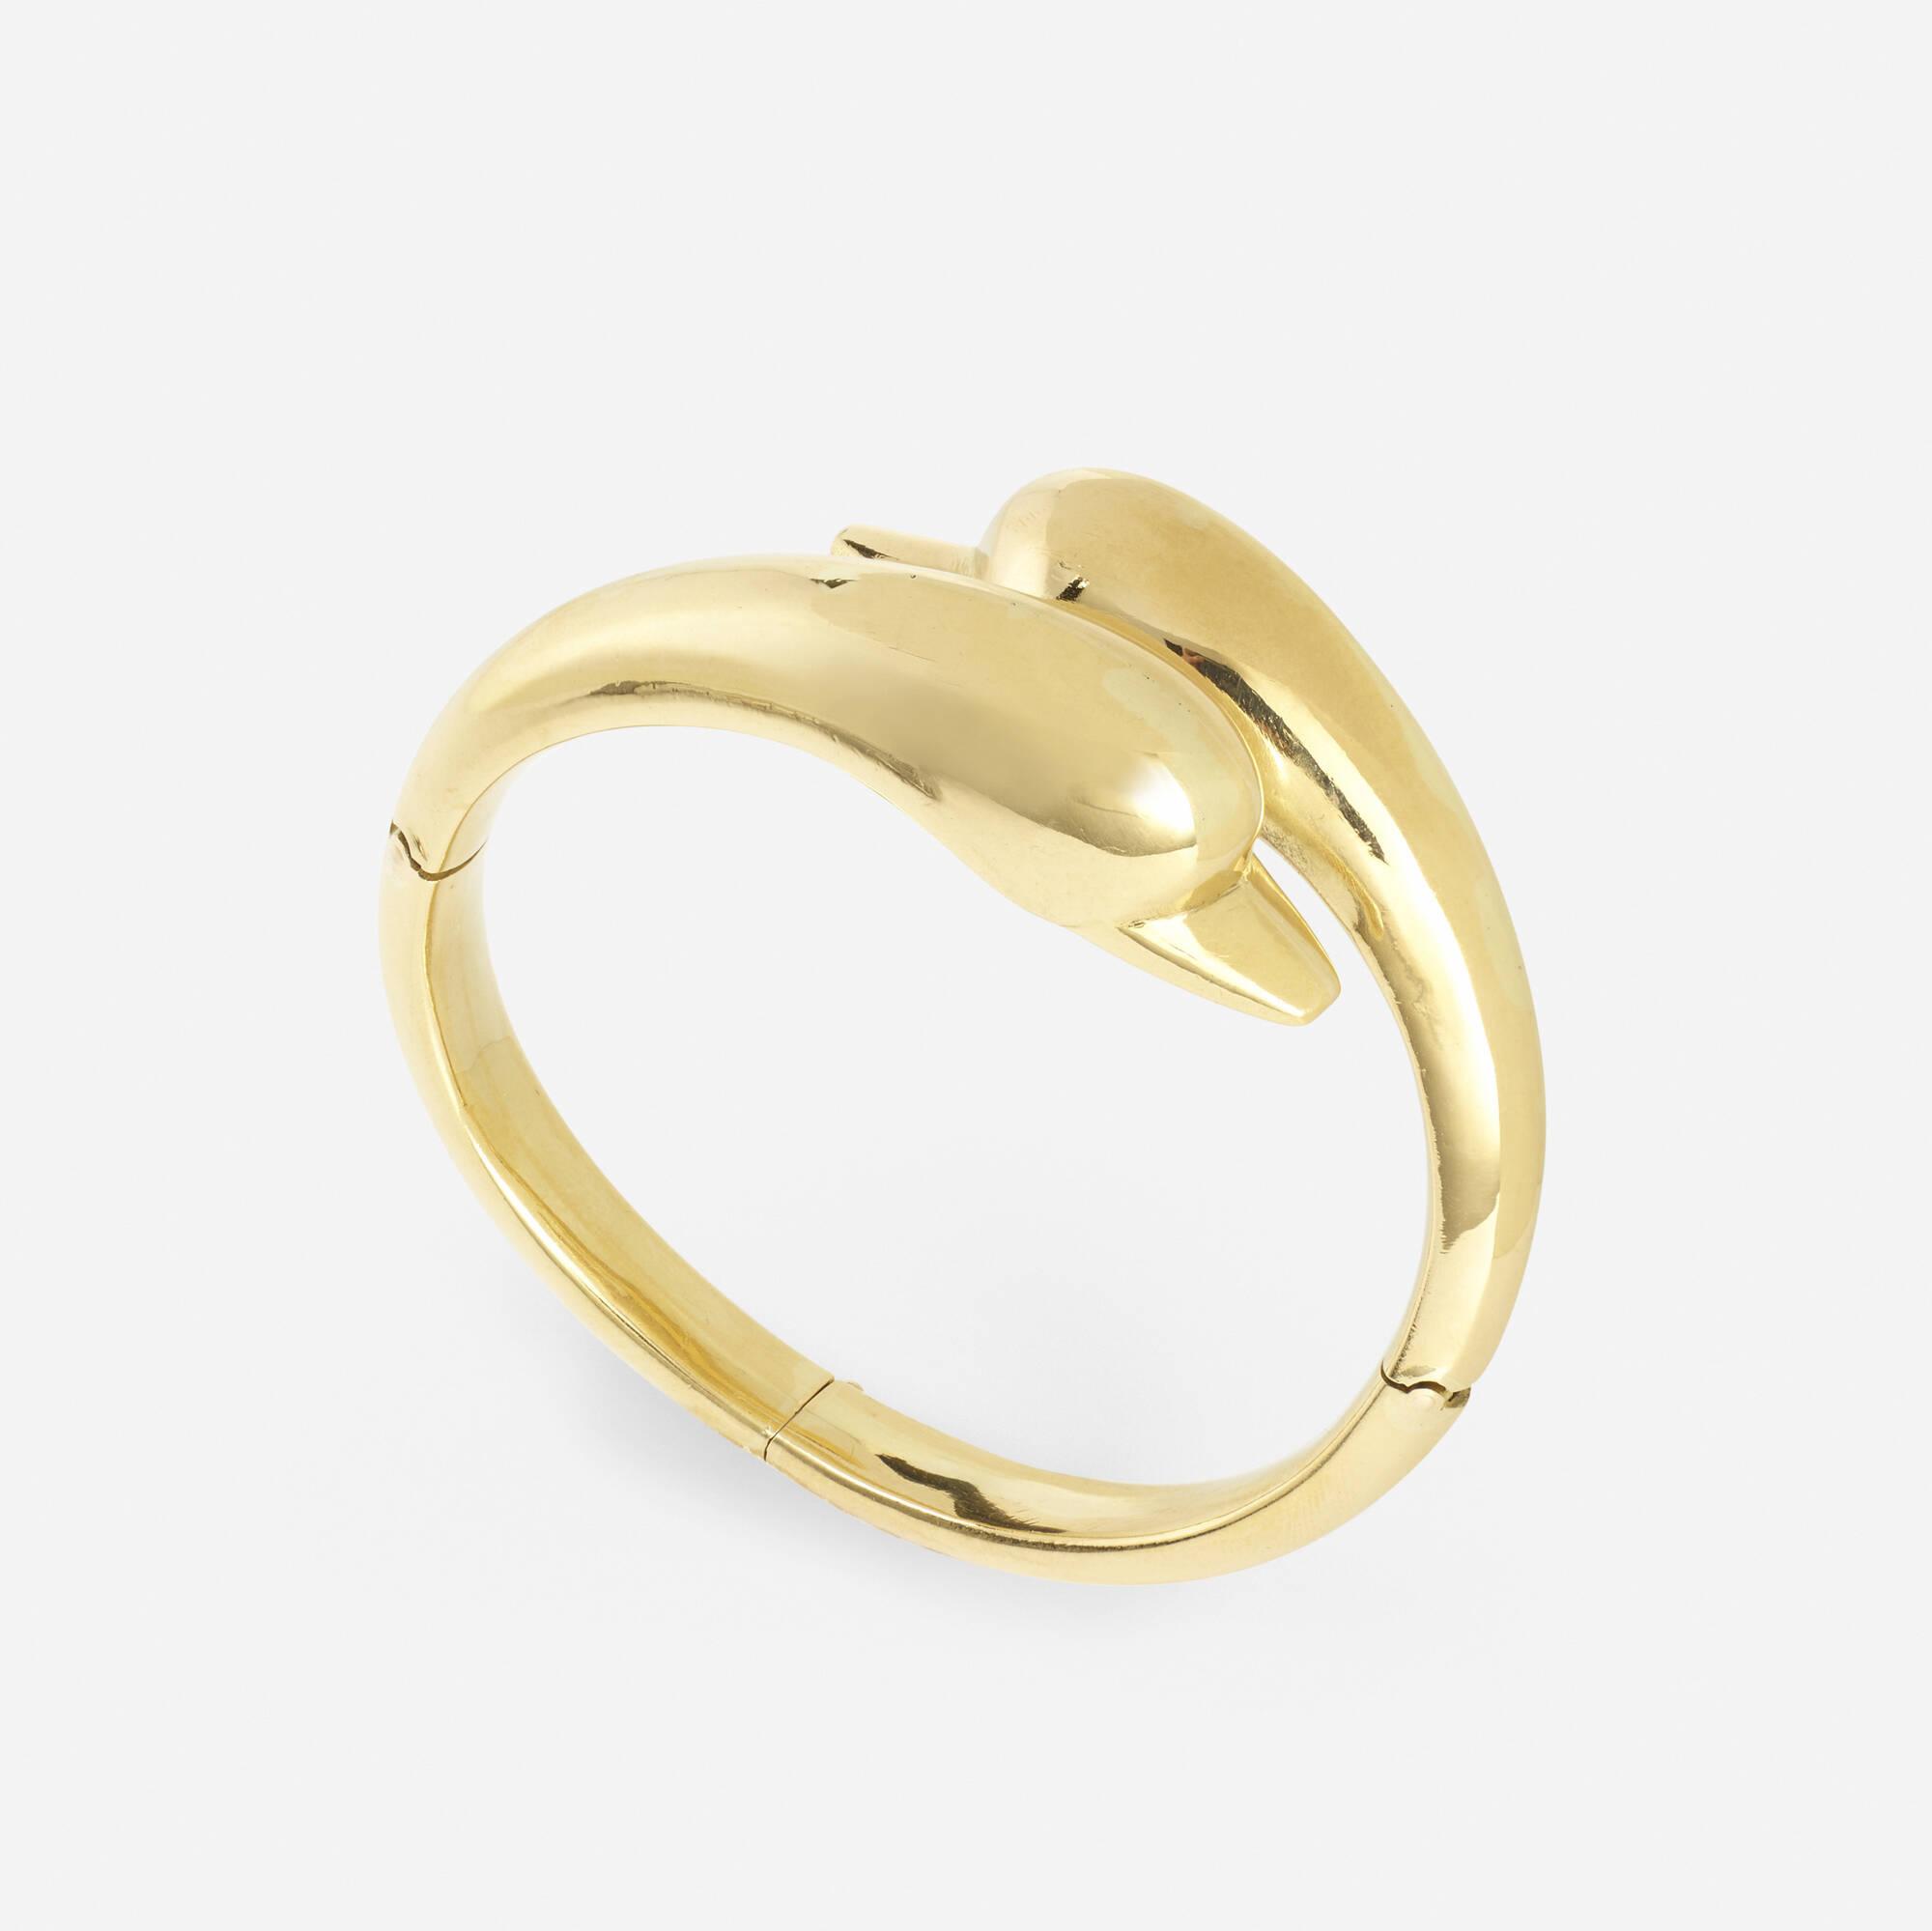 244: Lalaounis / A gold Swan bracelet (1 of 2)